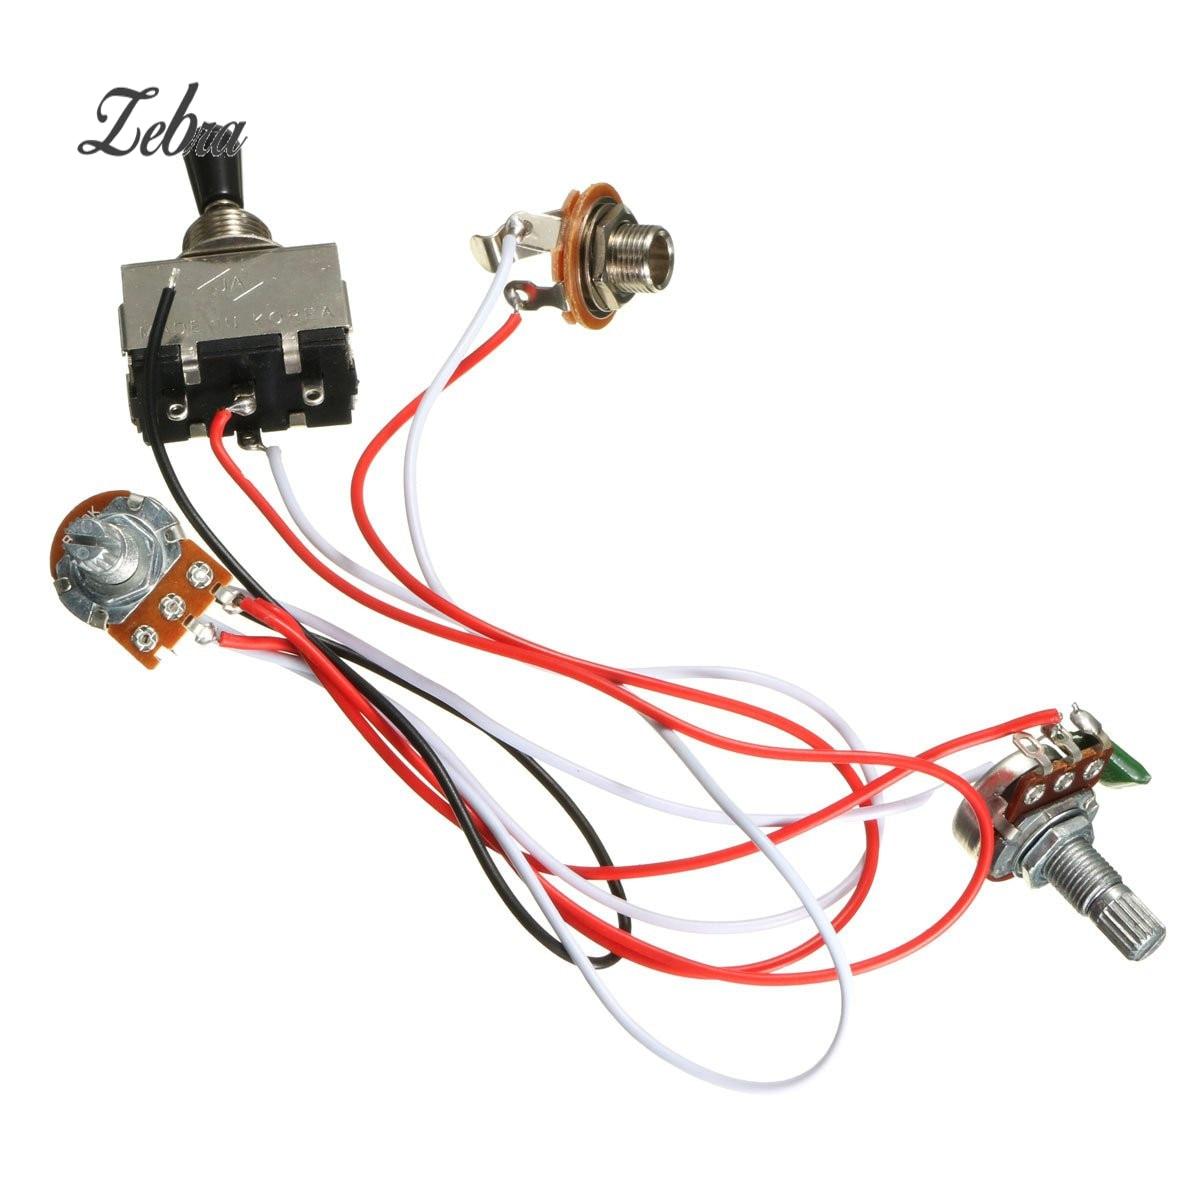 3 pcs set metal plastic electric guitar sound switch guitar volume guitar volume tone control wiring [ 1200 x 1200 Pixel ]